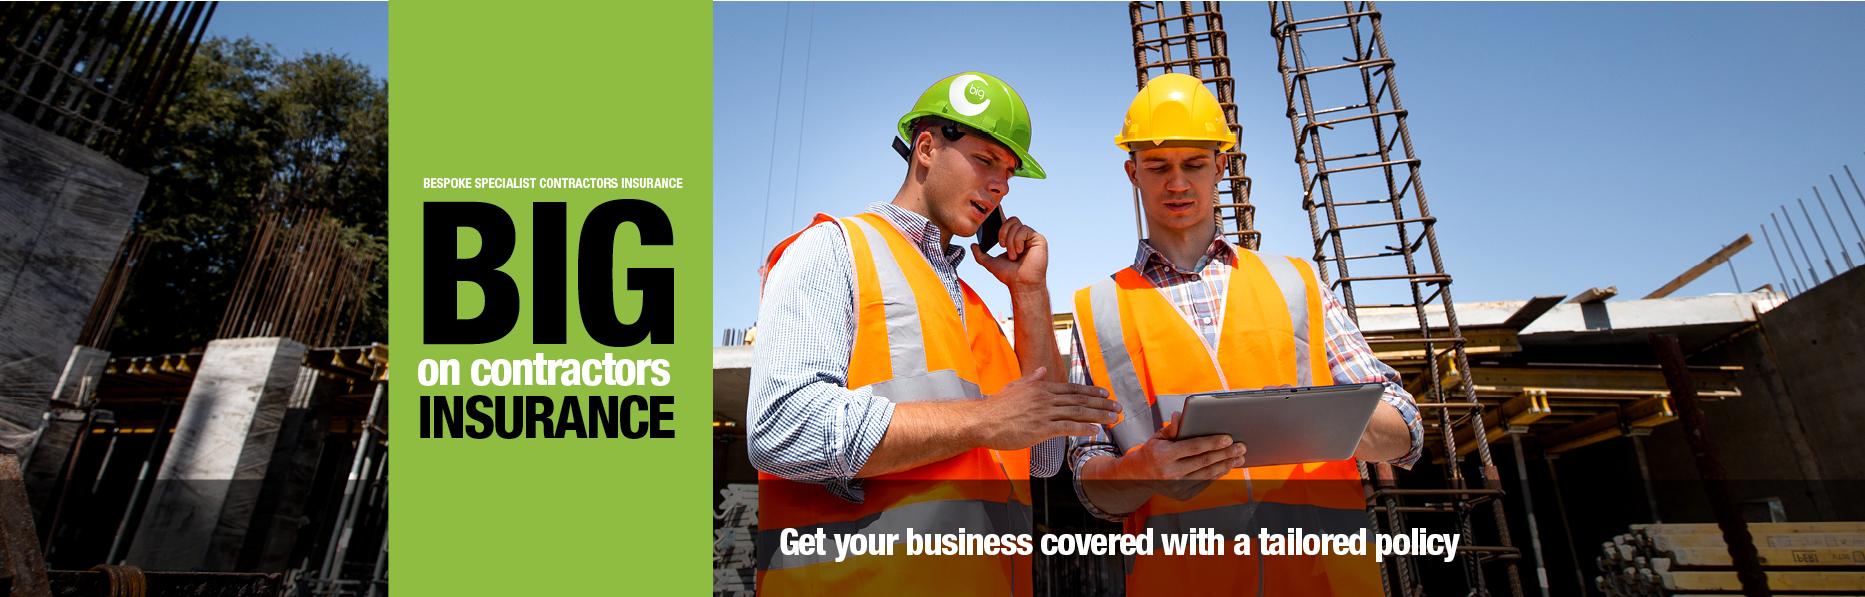 Commercial Insurance Broker based in Bournemouth - Big Insurance Ltd